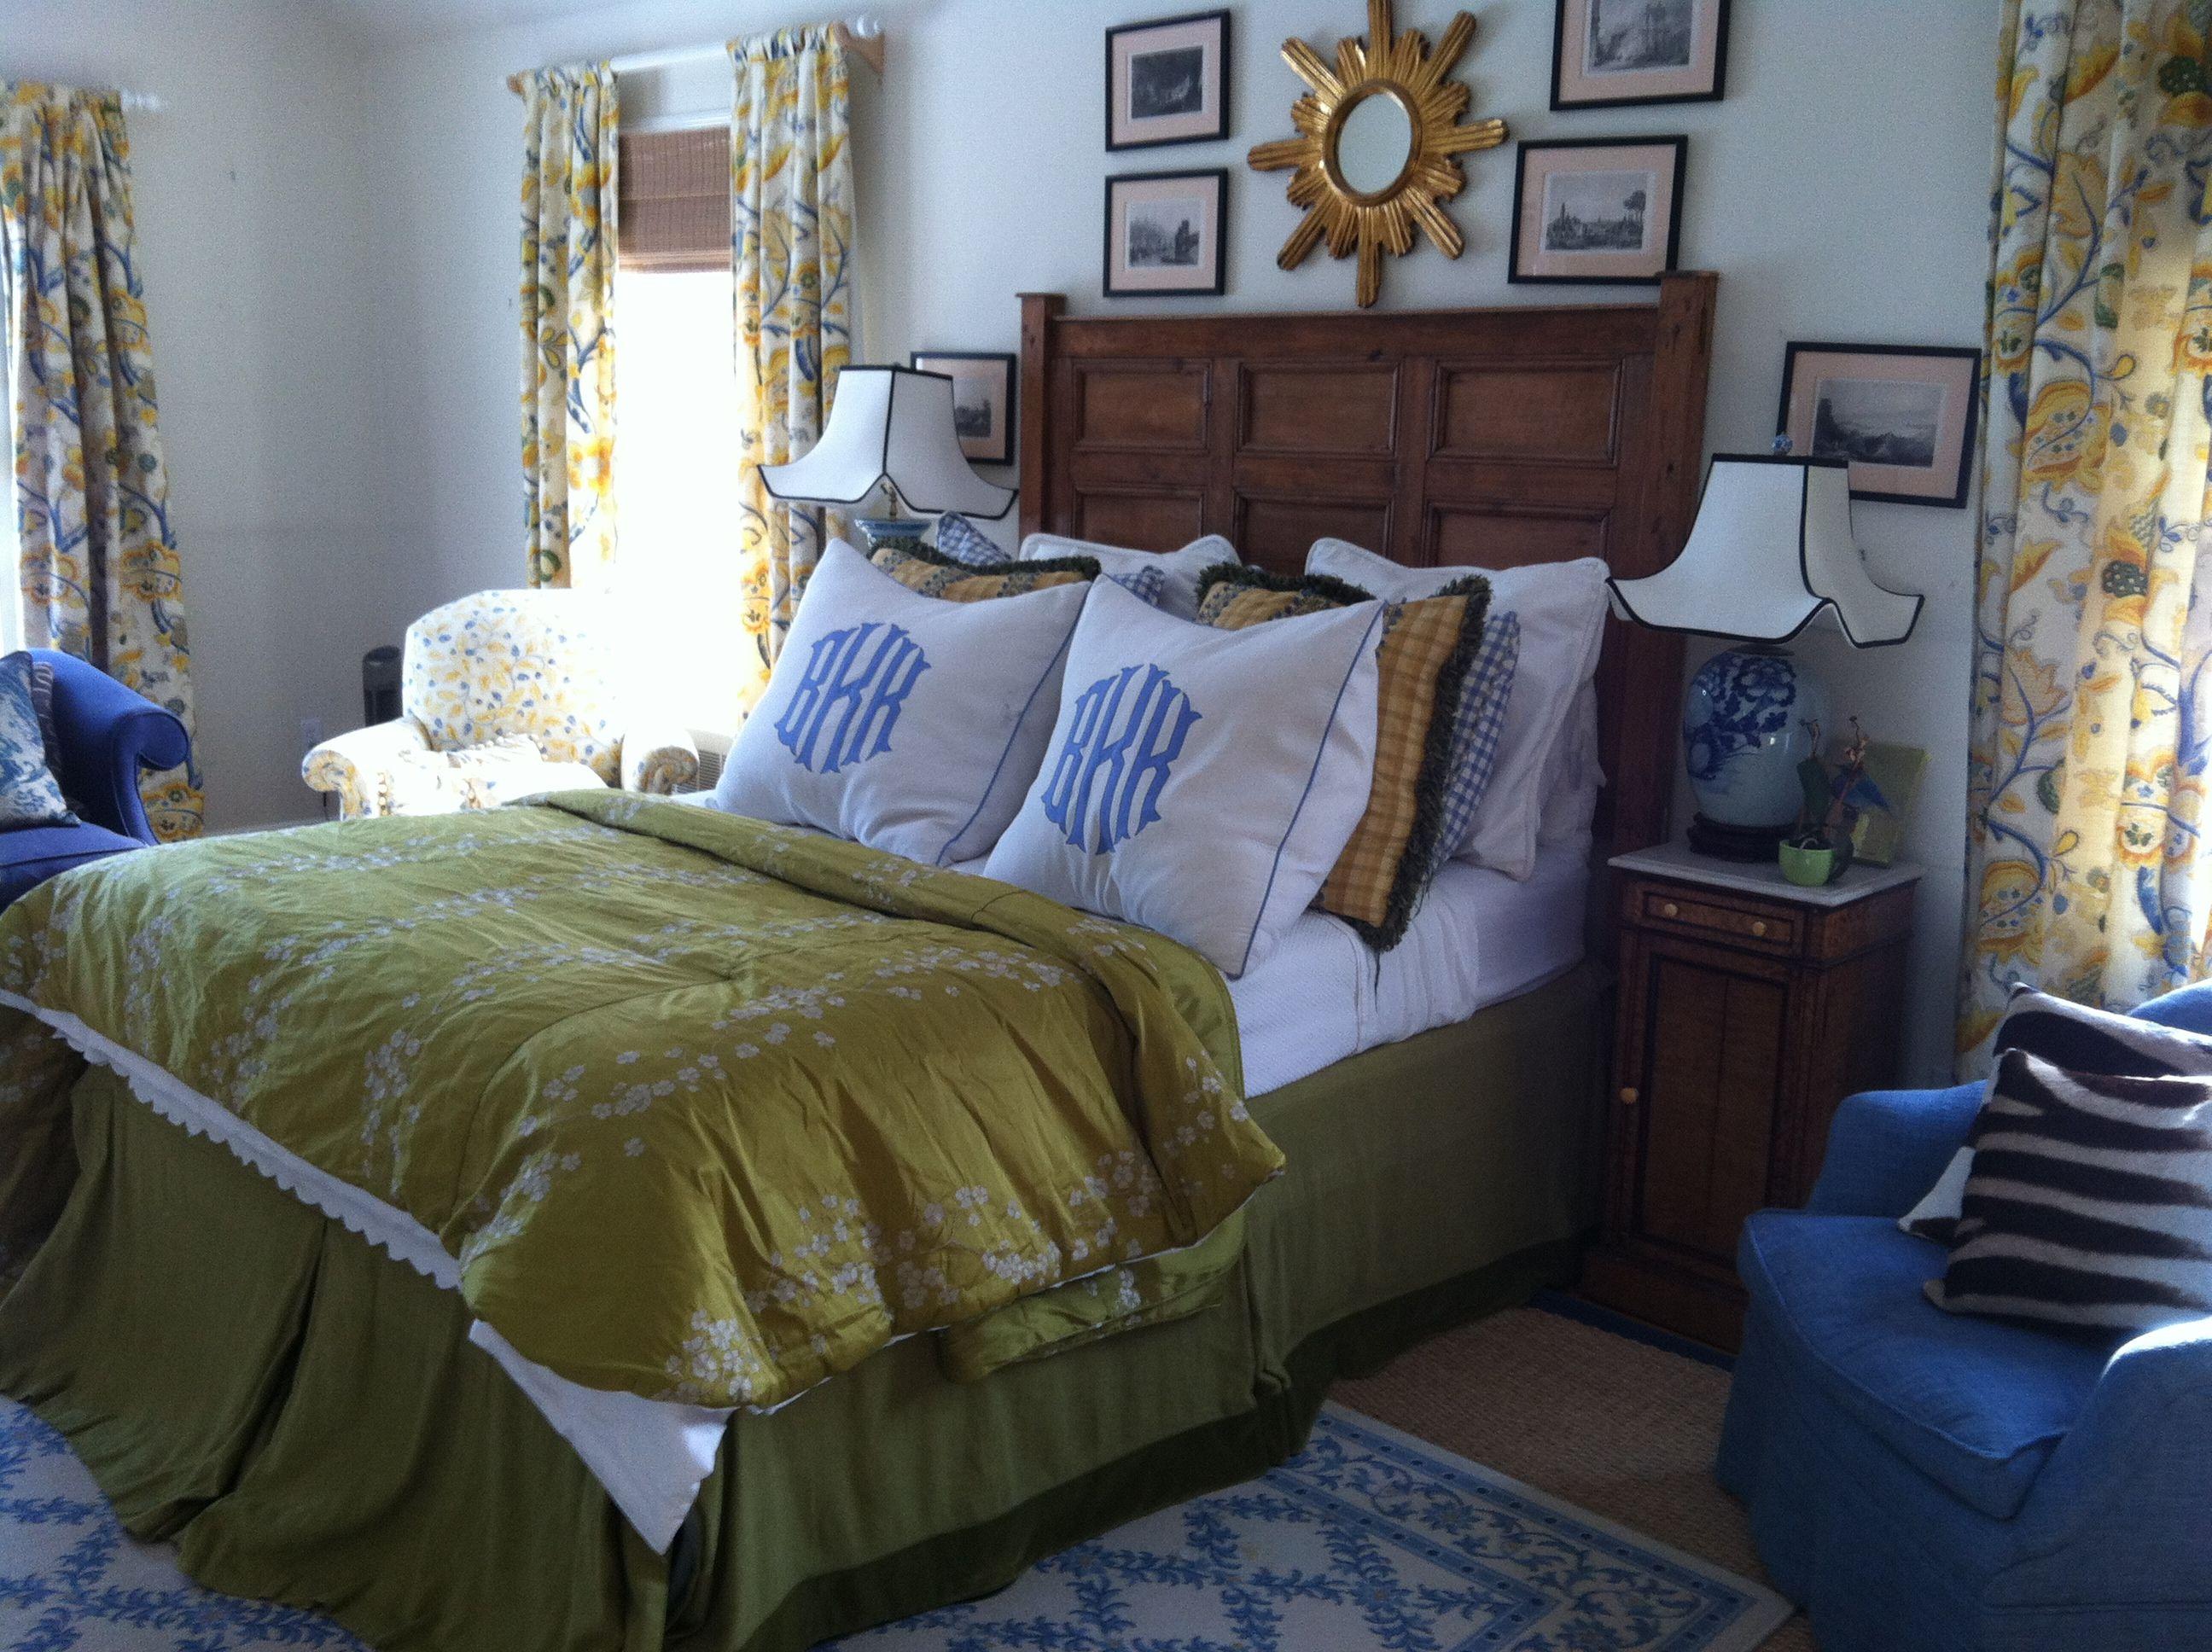 Bedrooms My beautiful Calico silk duvet